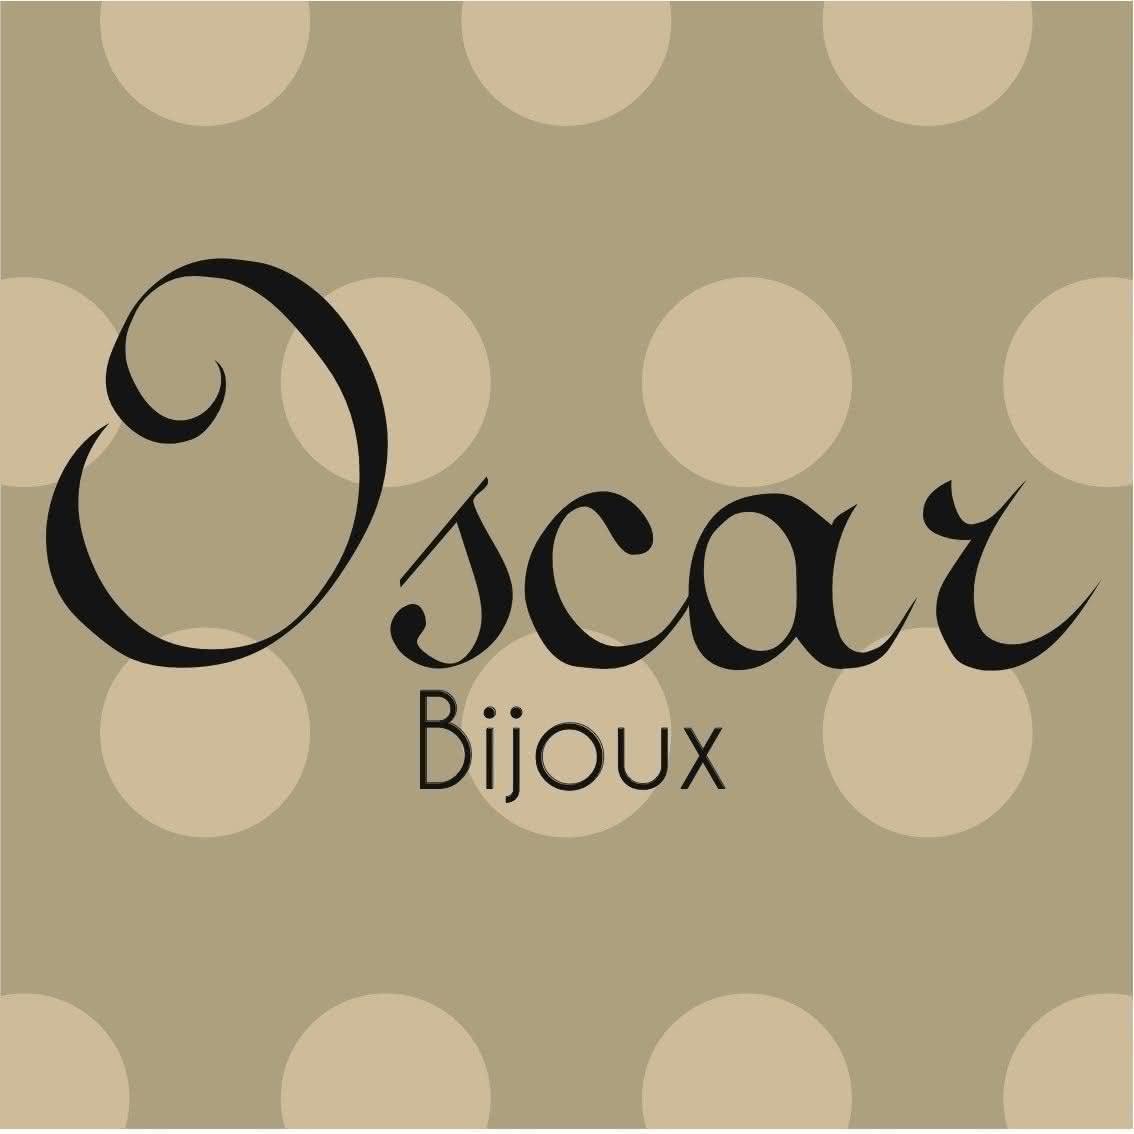 Oscar Bijoux